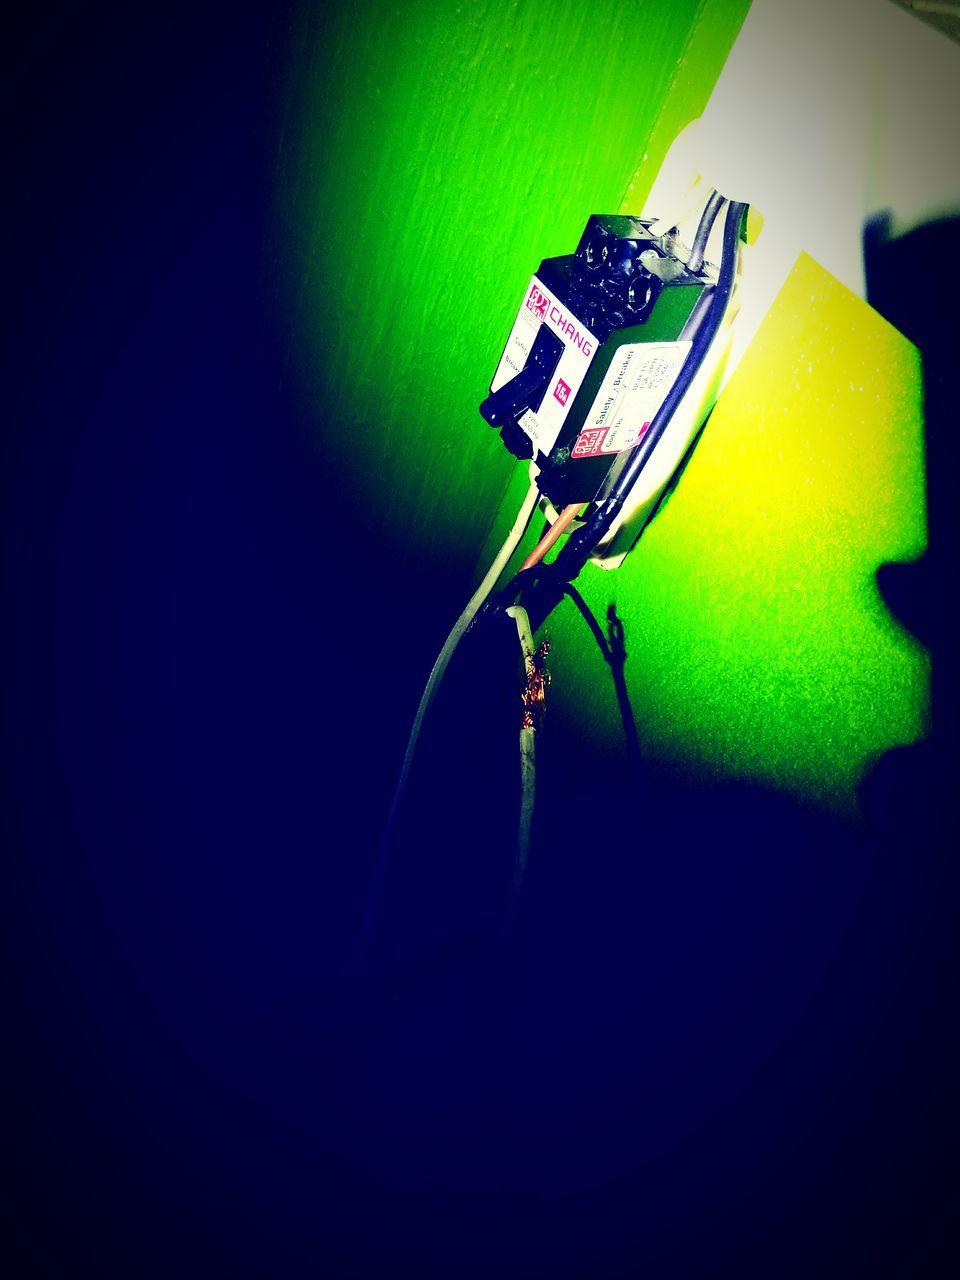 green color, indoors, music, no people, shadow, illuminated, spotlight, close-up, night